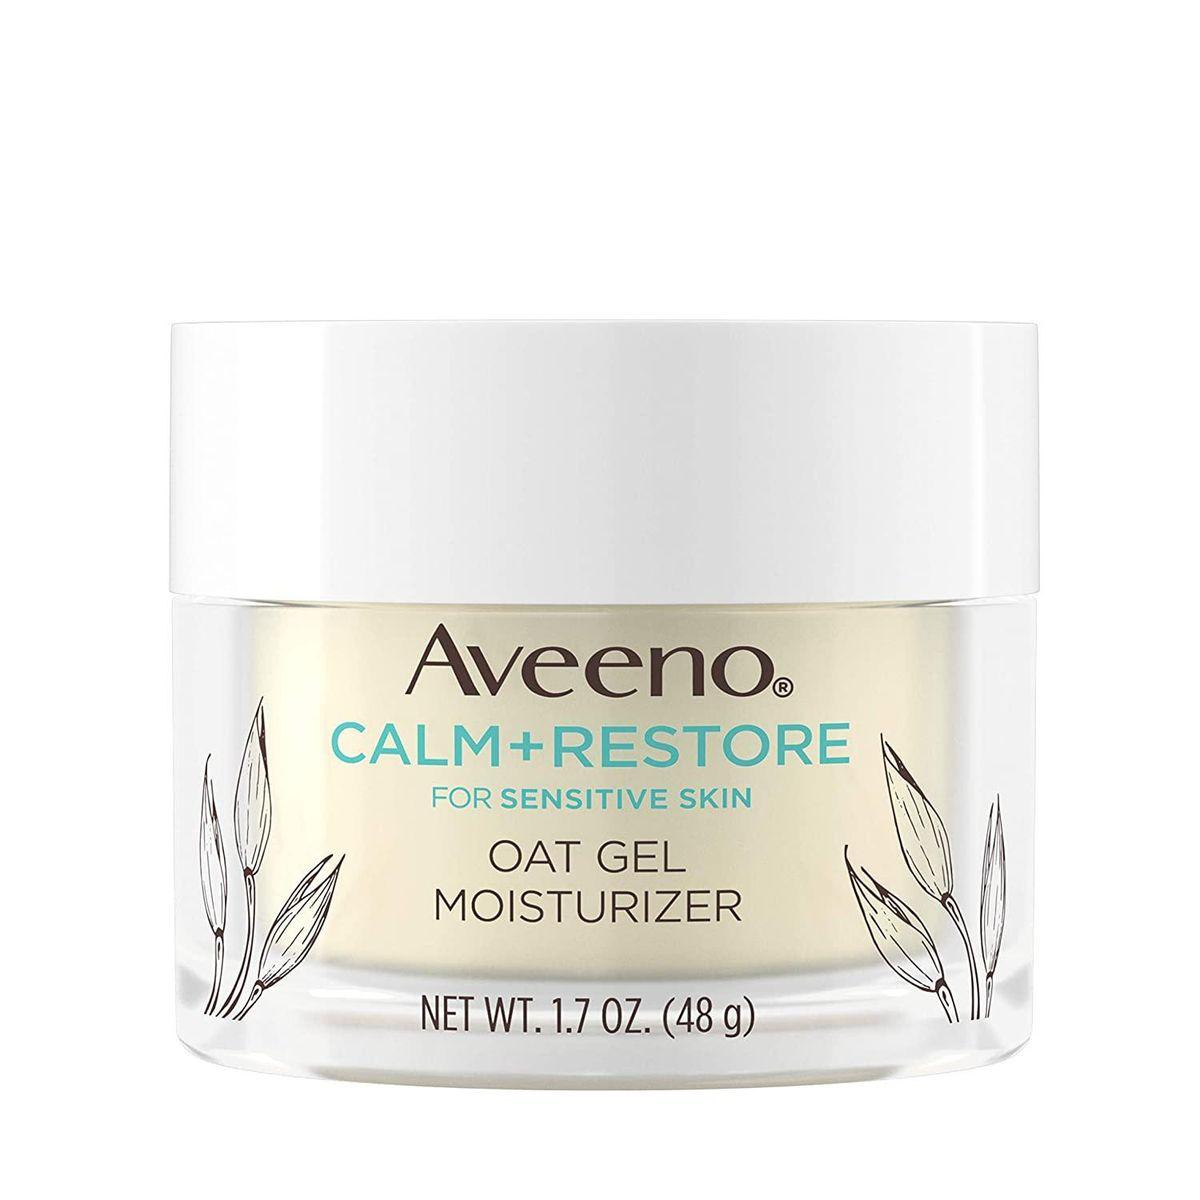 Calm + Restore Oat Gel Facial Moisturizer